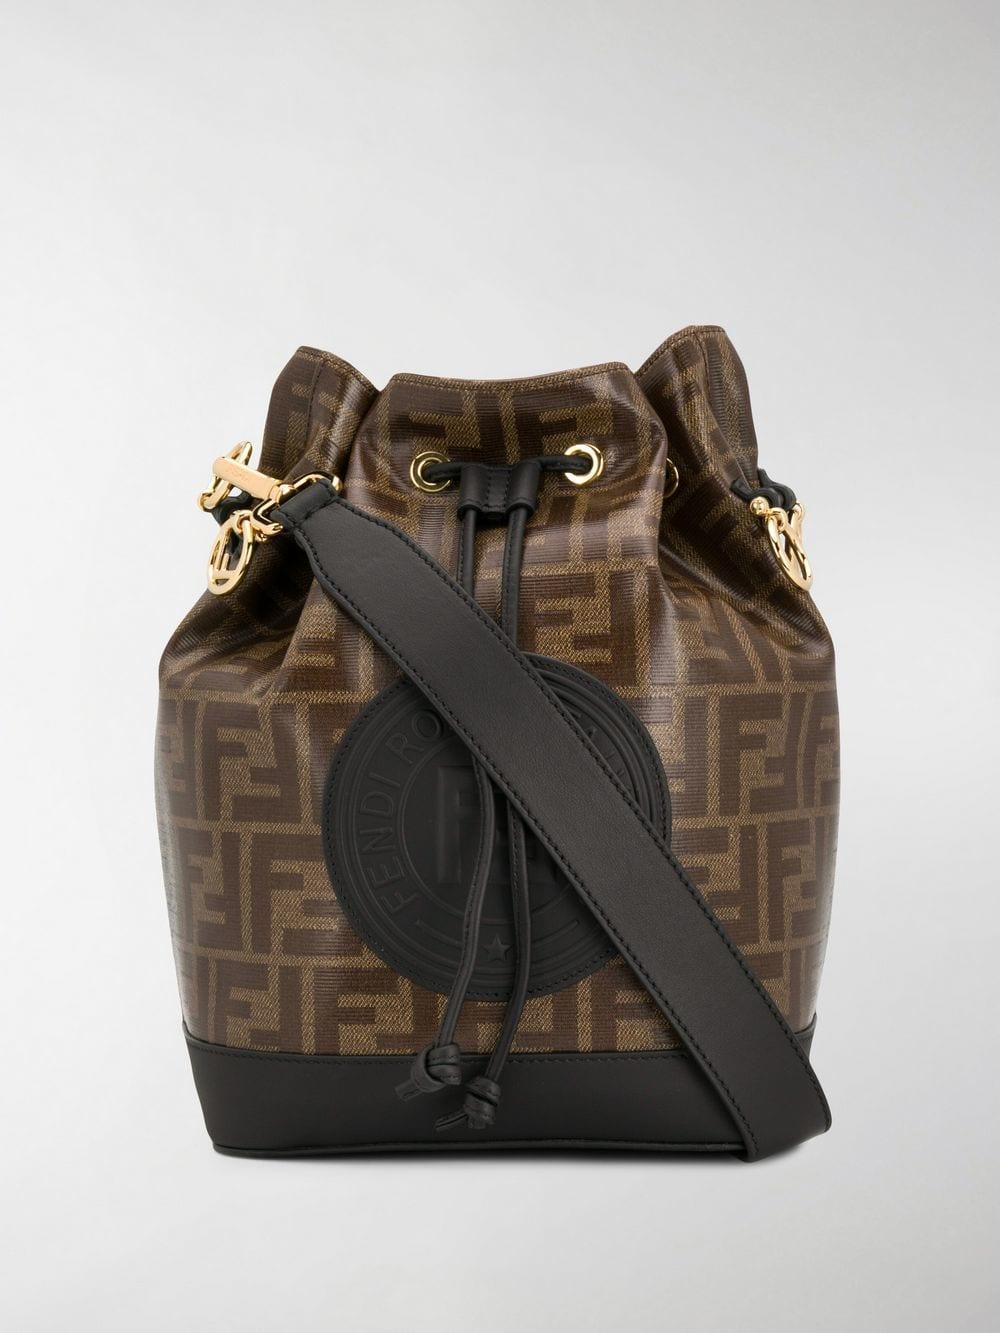 Fendi Mon Tresor Bucket Bag in Brown - Lyst ffb1cd1528617